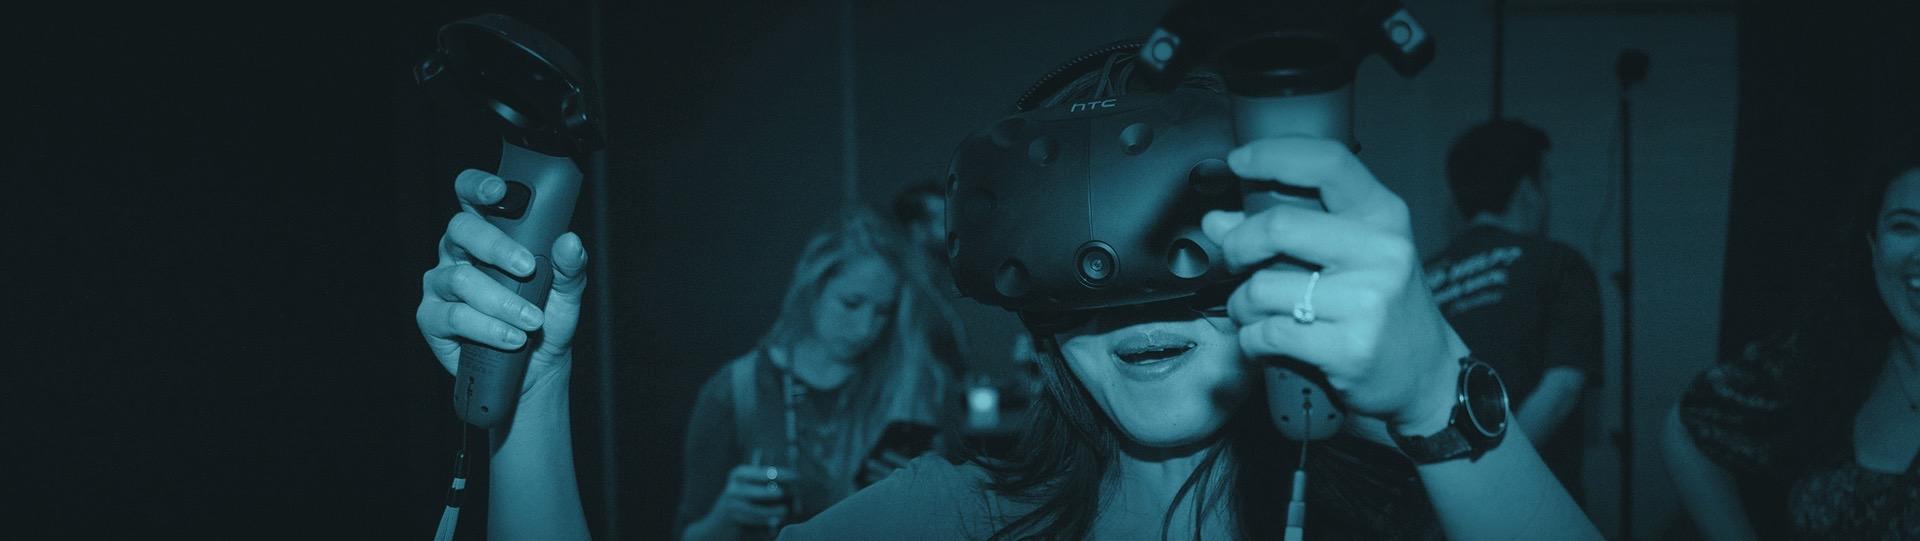 Virtual Reality Rental Co., using virtual reality